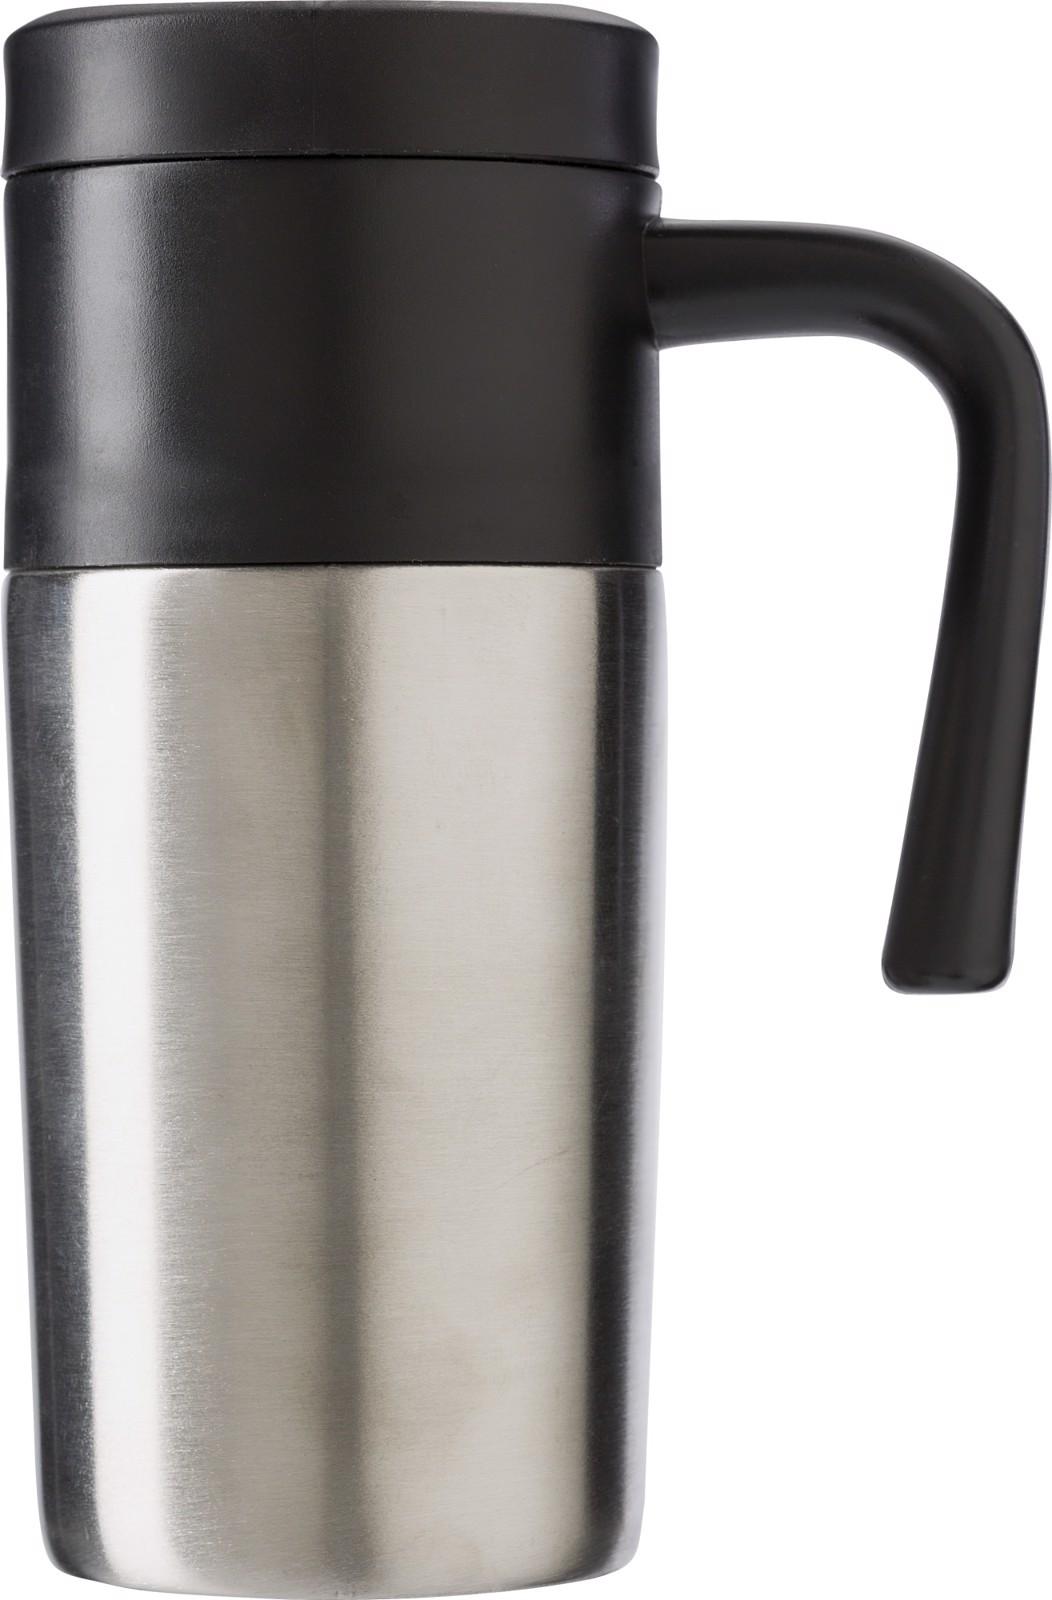 Stainless steel mug - Silver